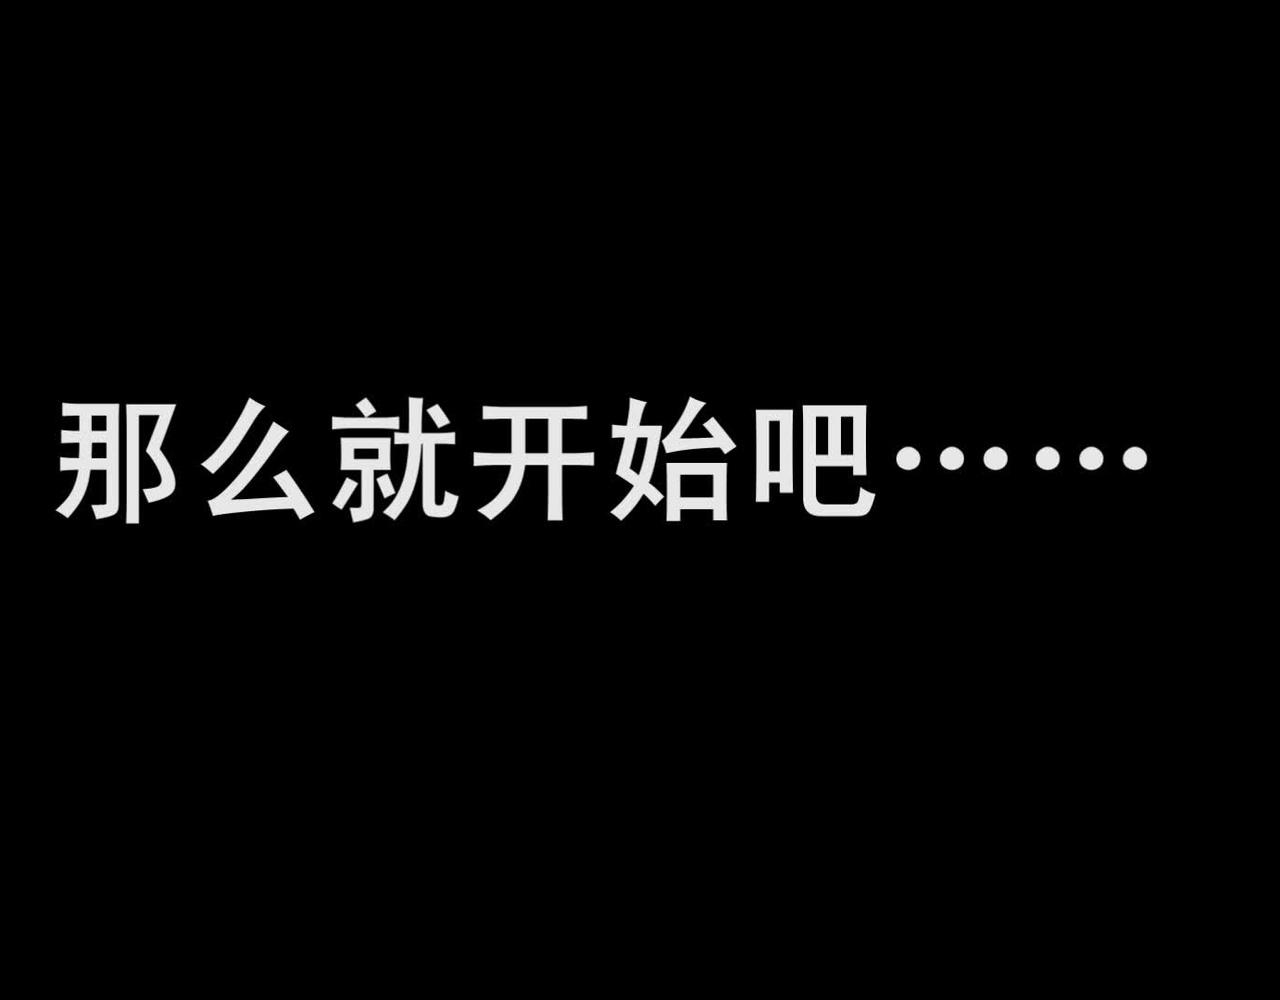 【WOTA艺】迎新年远程联打